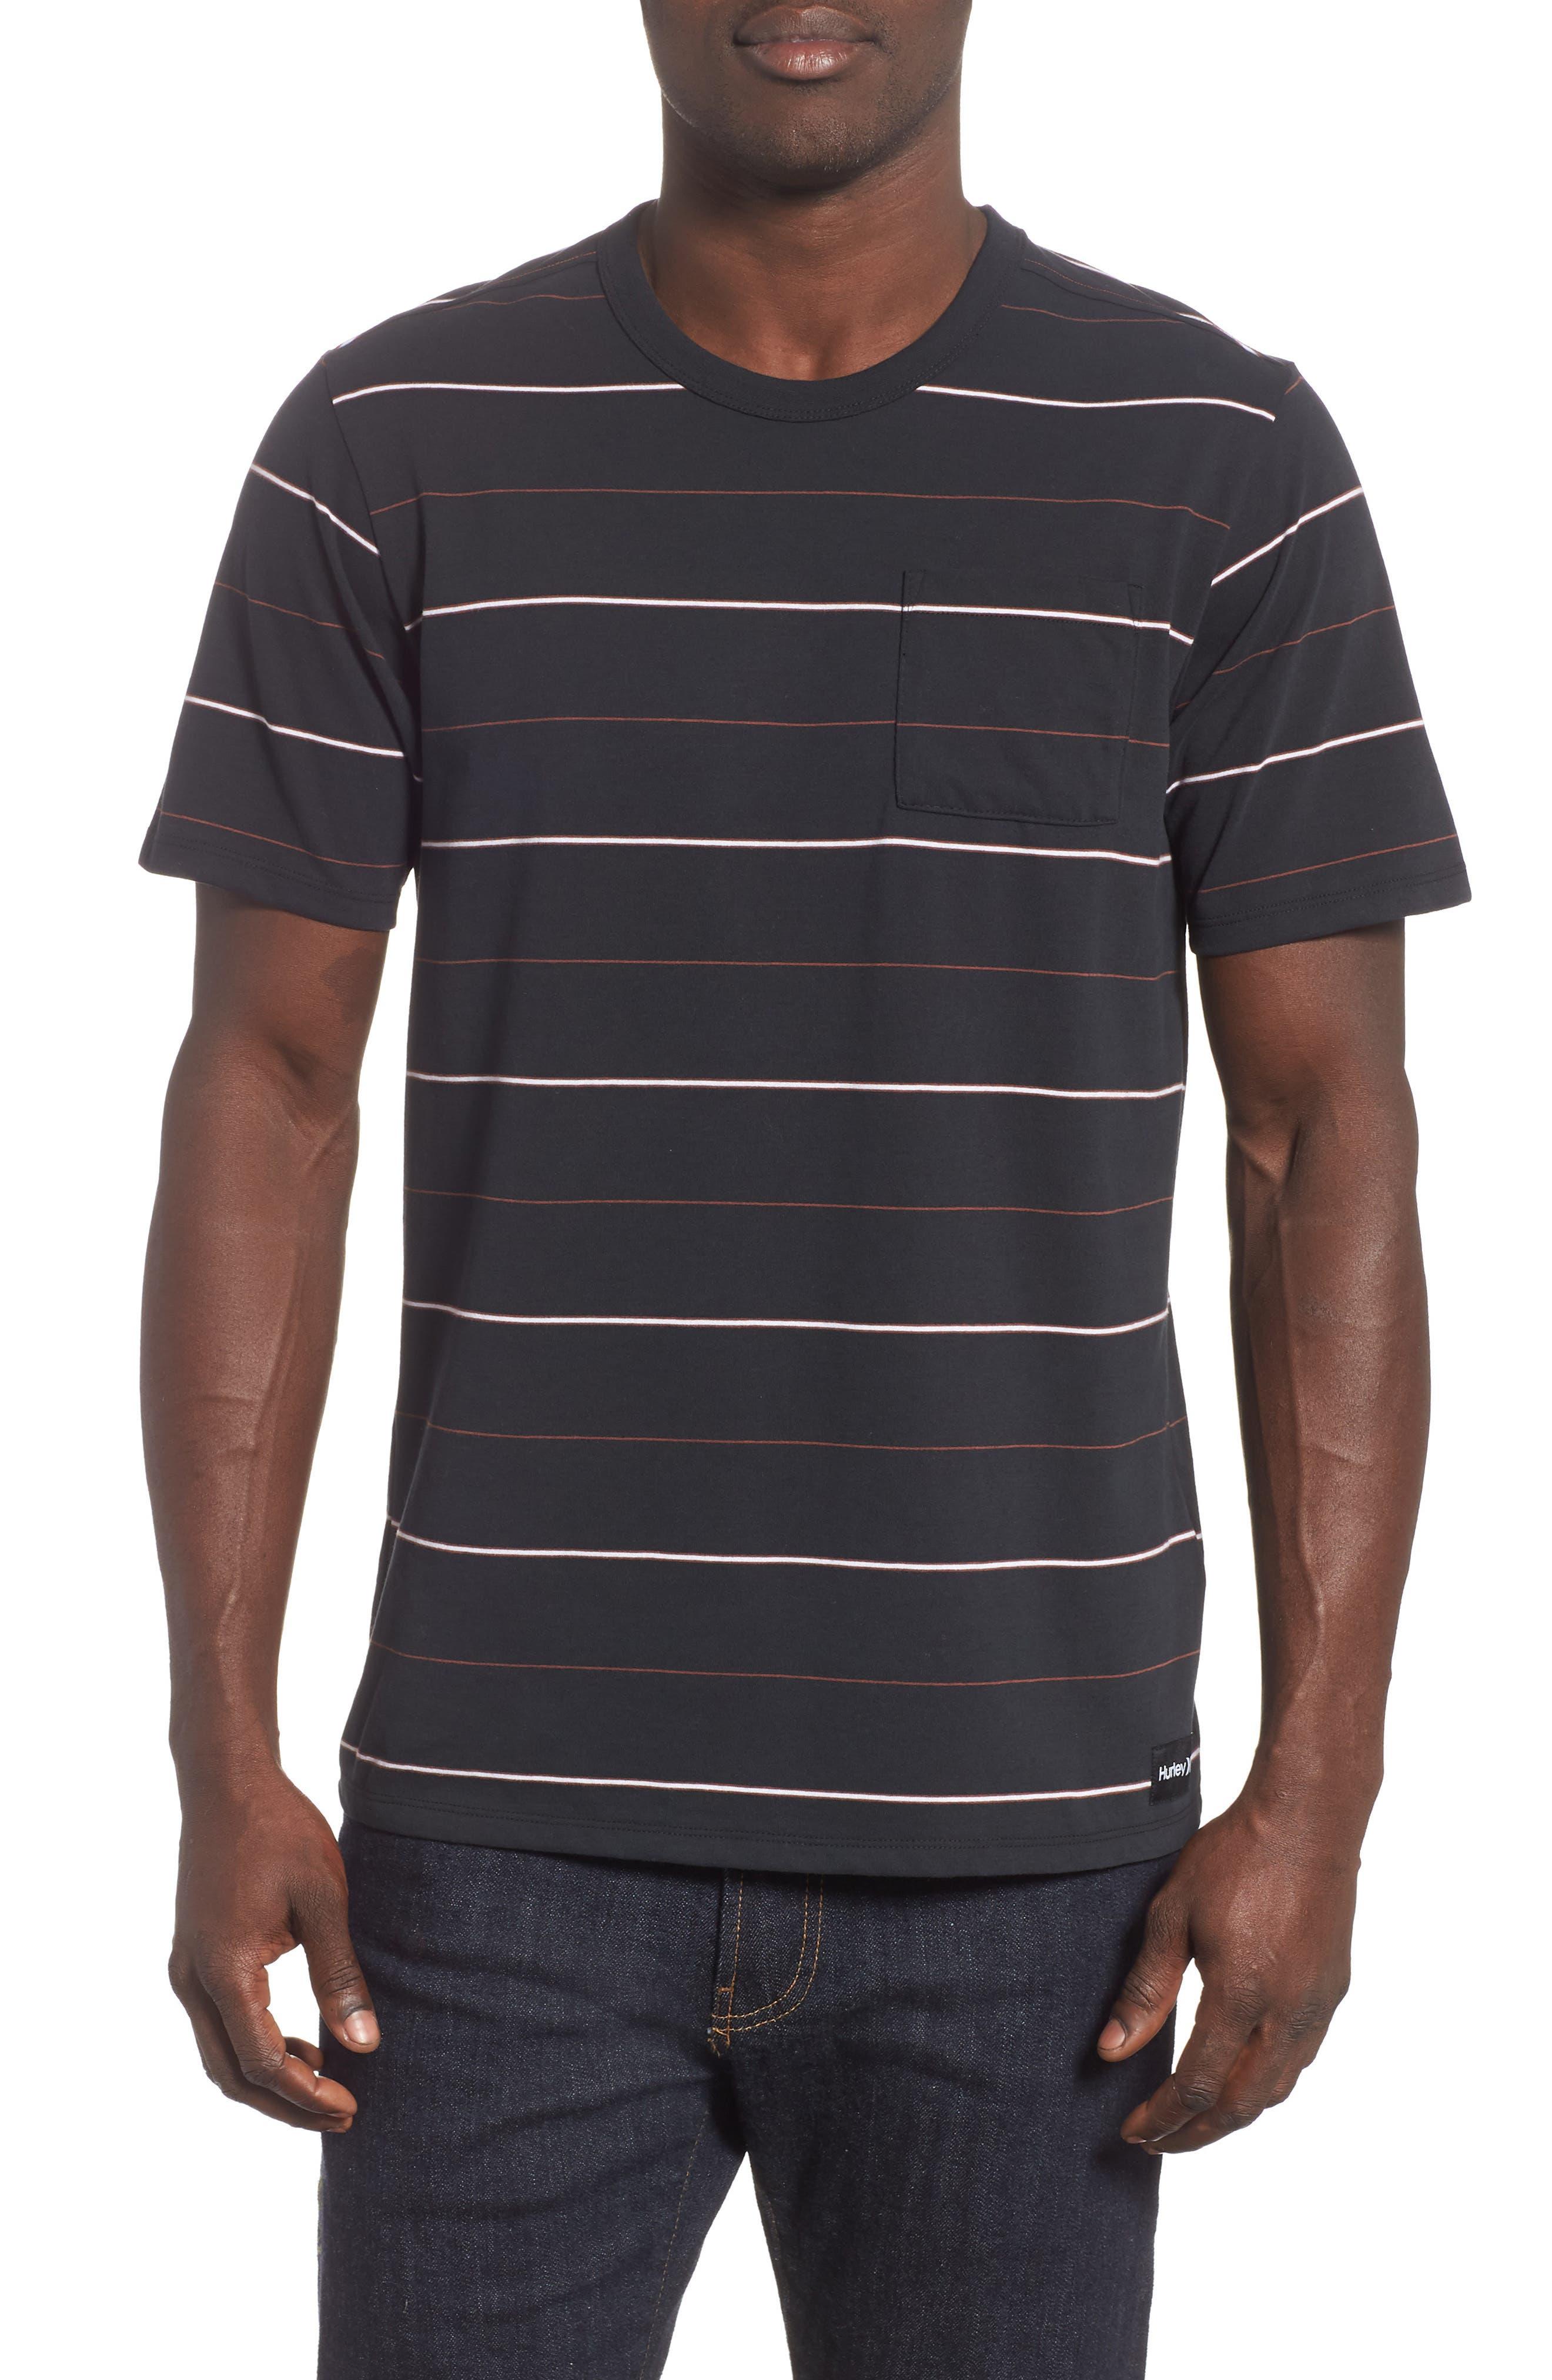 Hurley Dri-Fit Straya Stripe Pocket T-Shirt, Black